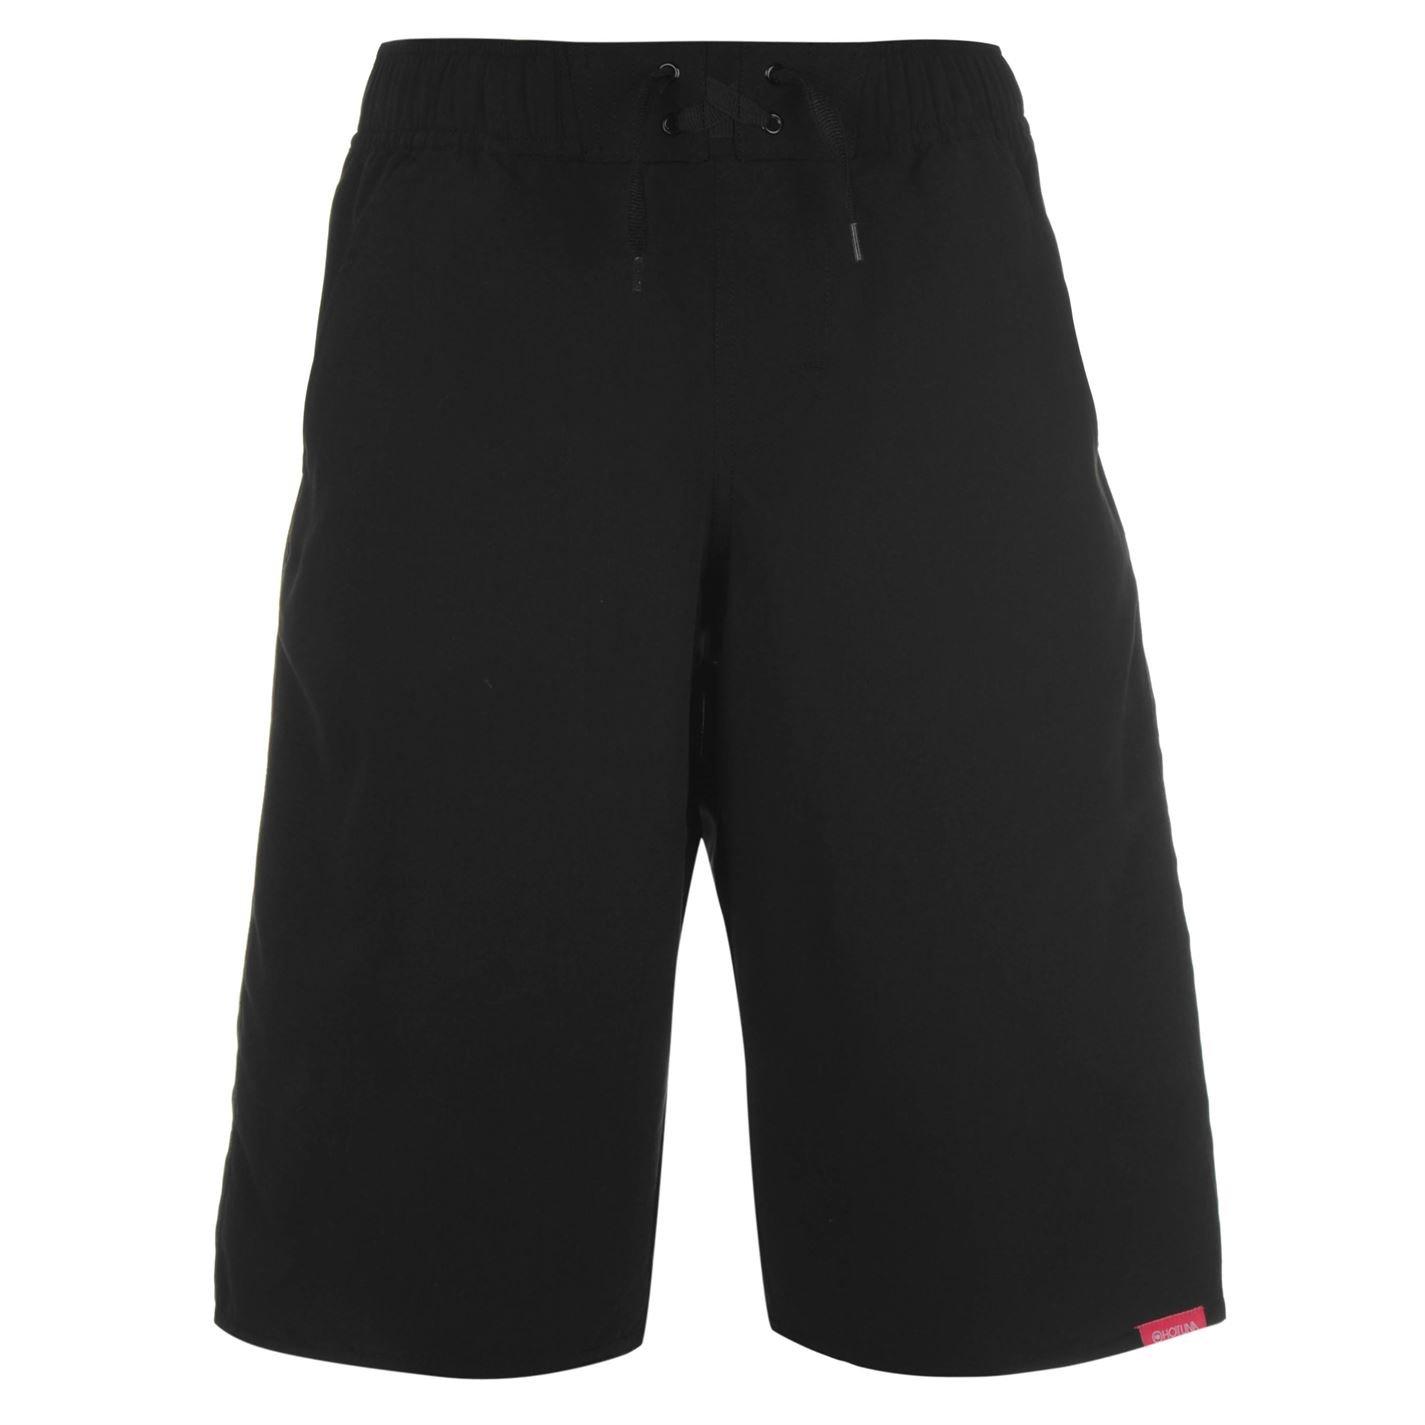 Hot Tuna Women's Swimming Shorts